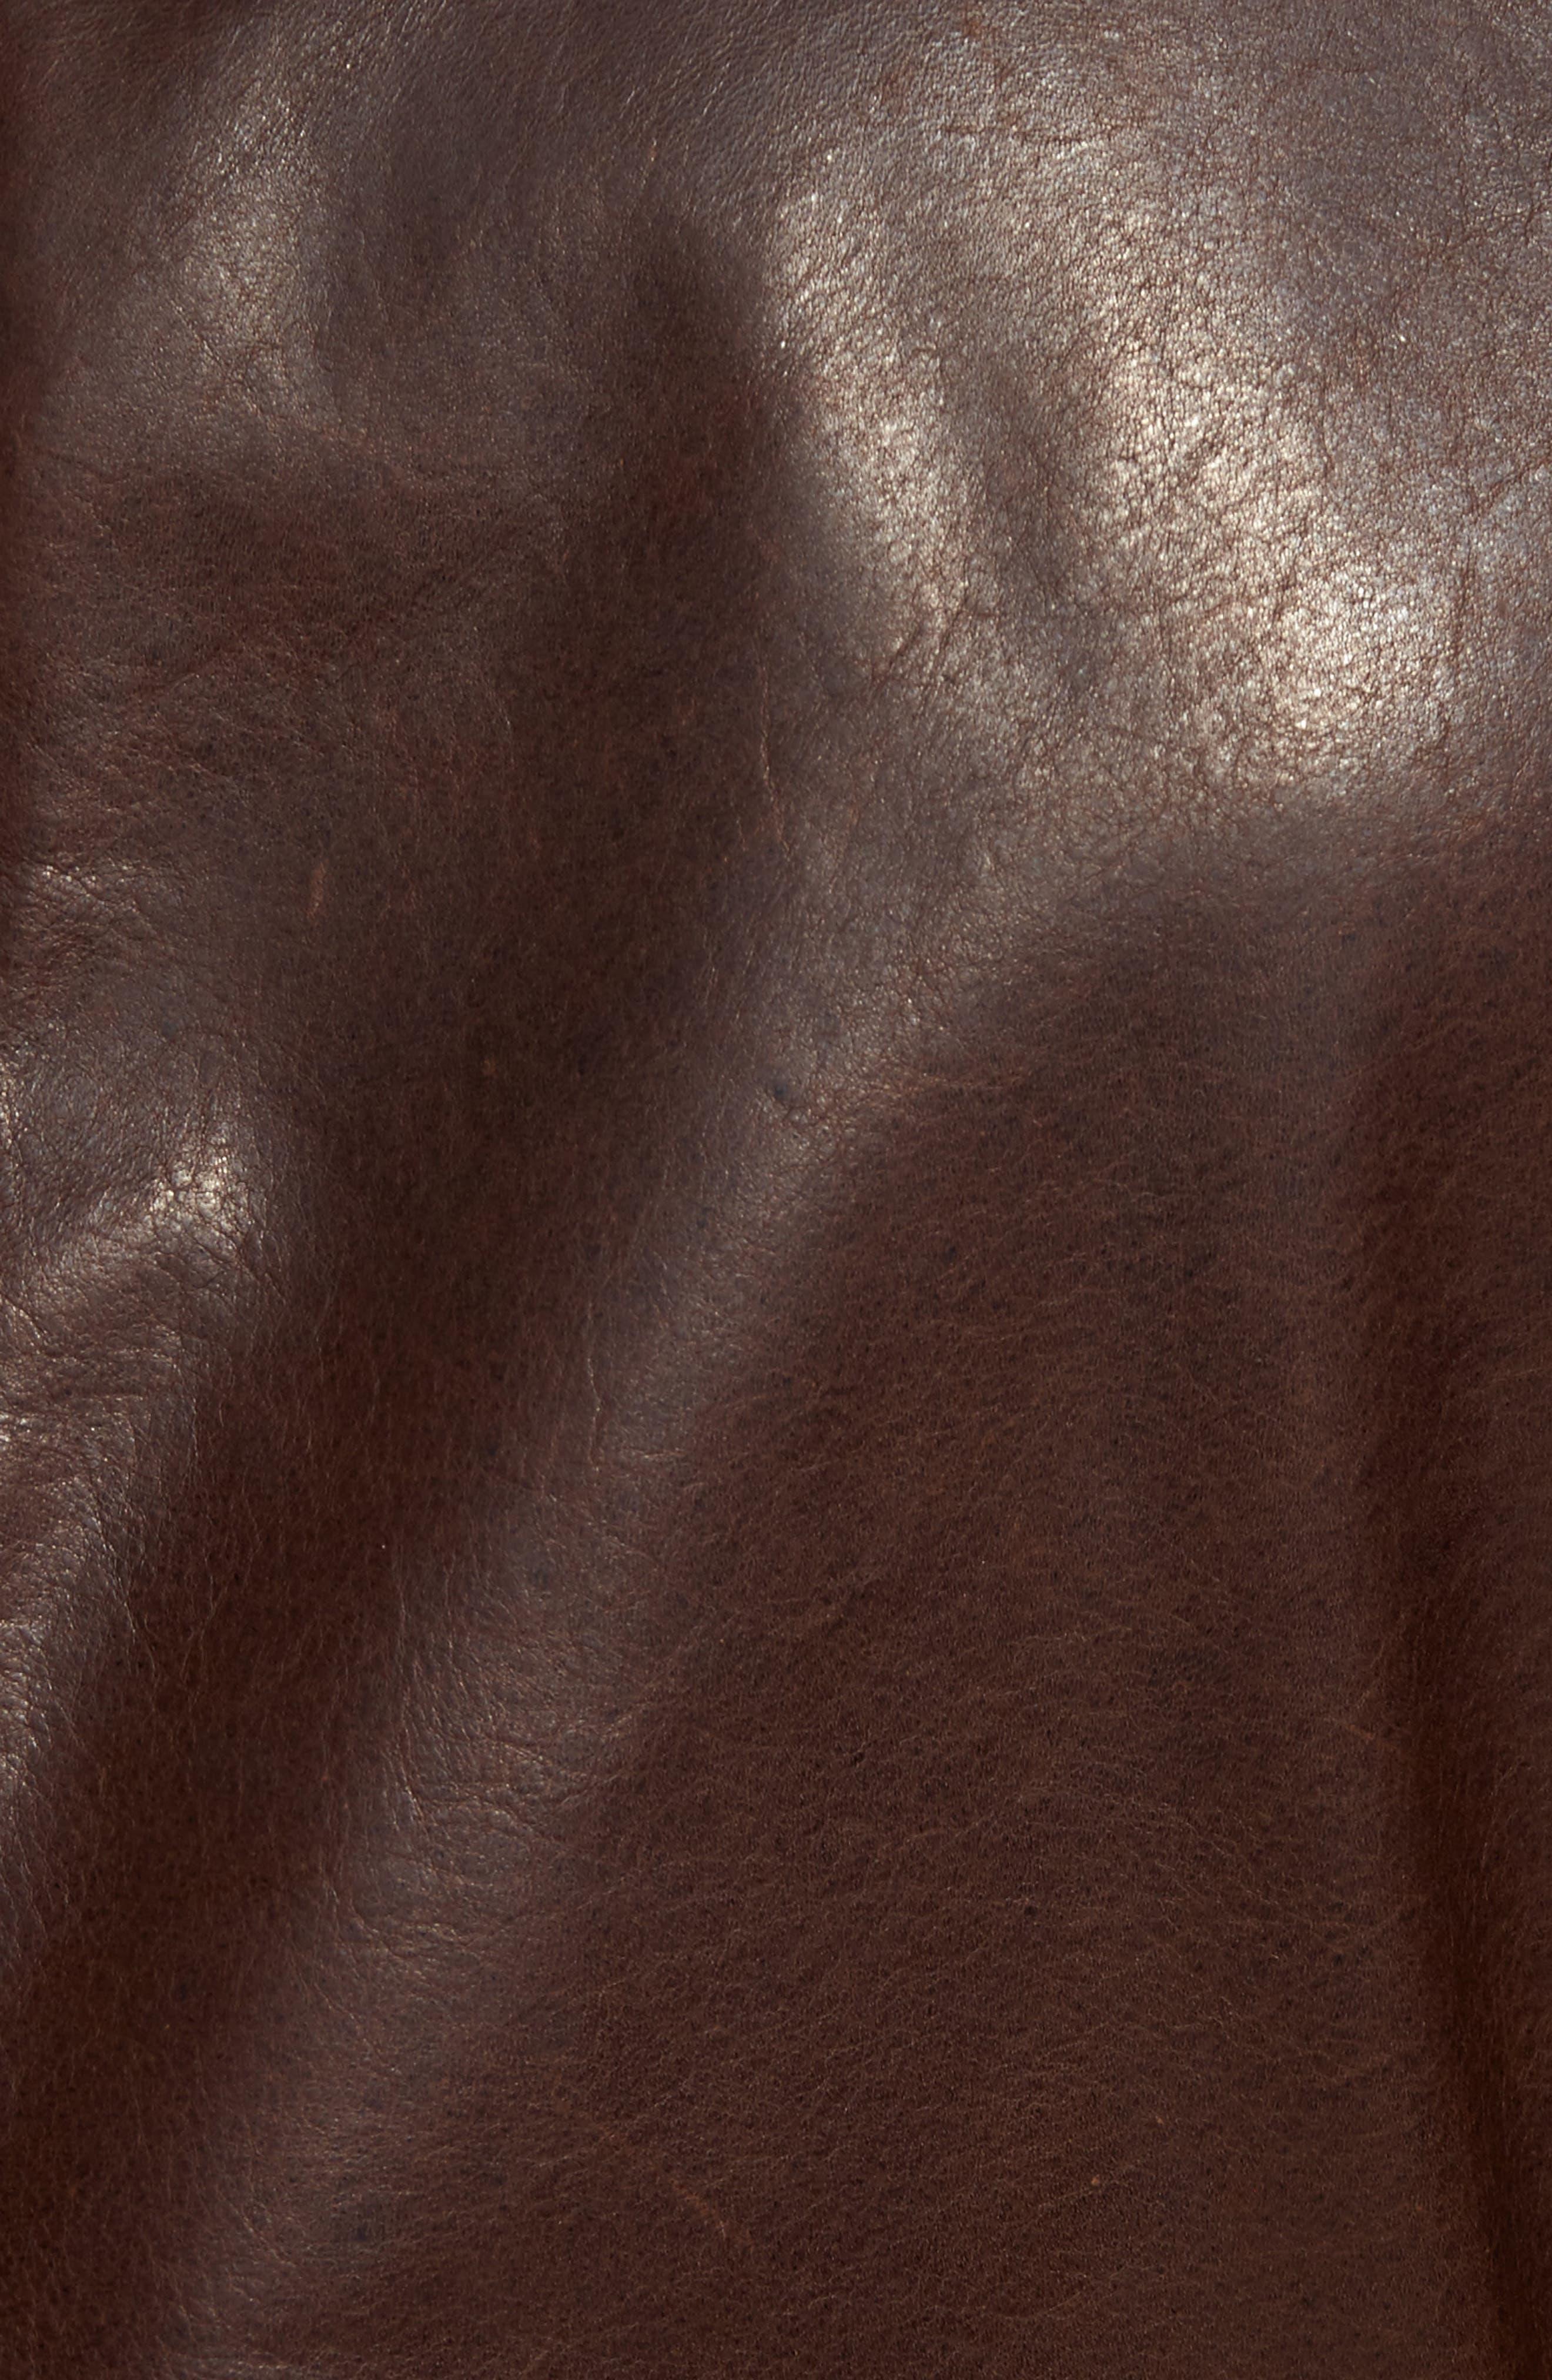 Café Racer Unlined Cowhide Leather Jacket,                             Alternate thumbnail 5, color,                             Brown